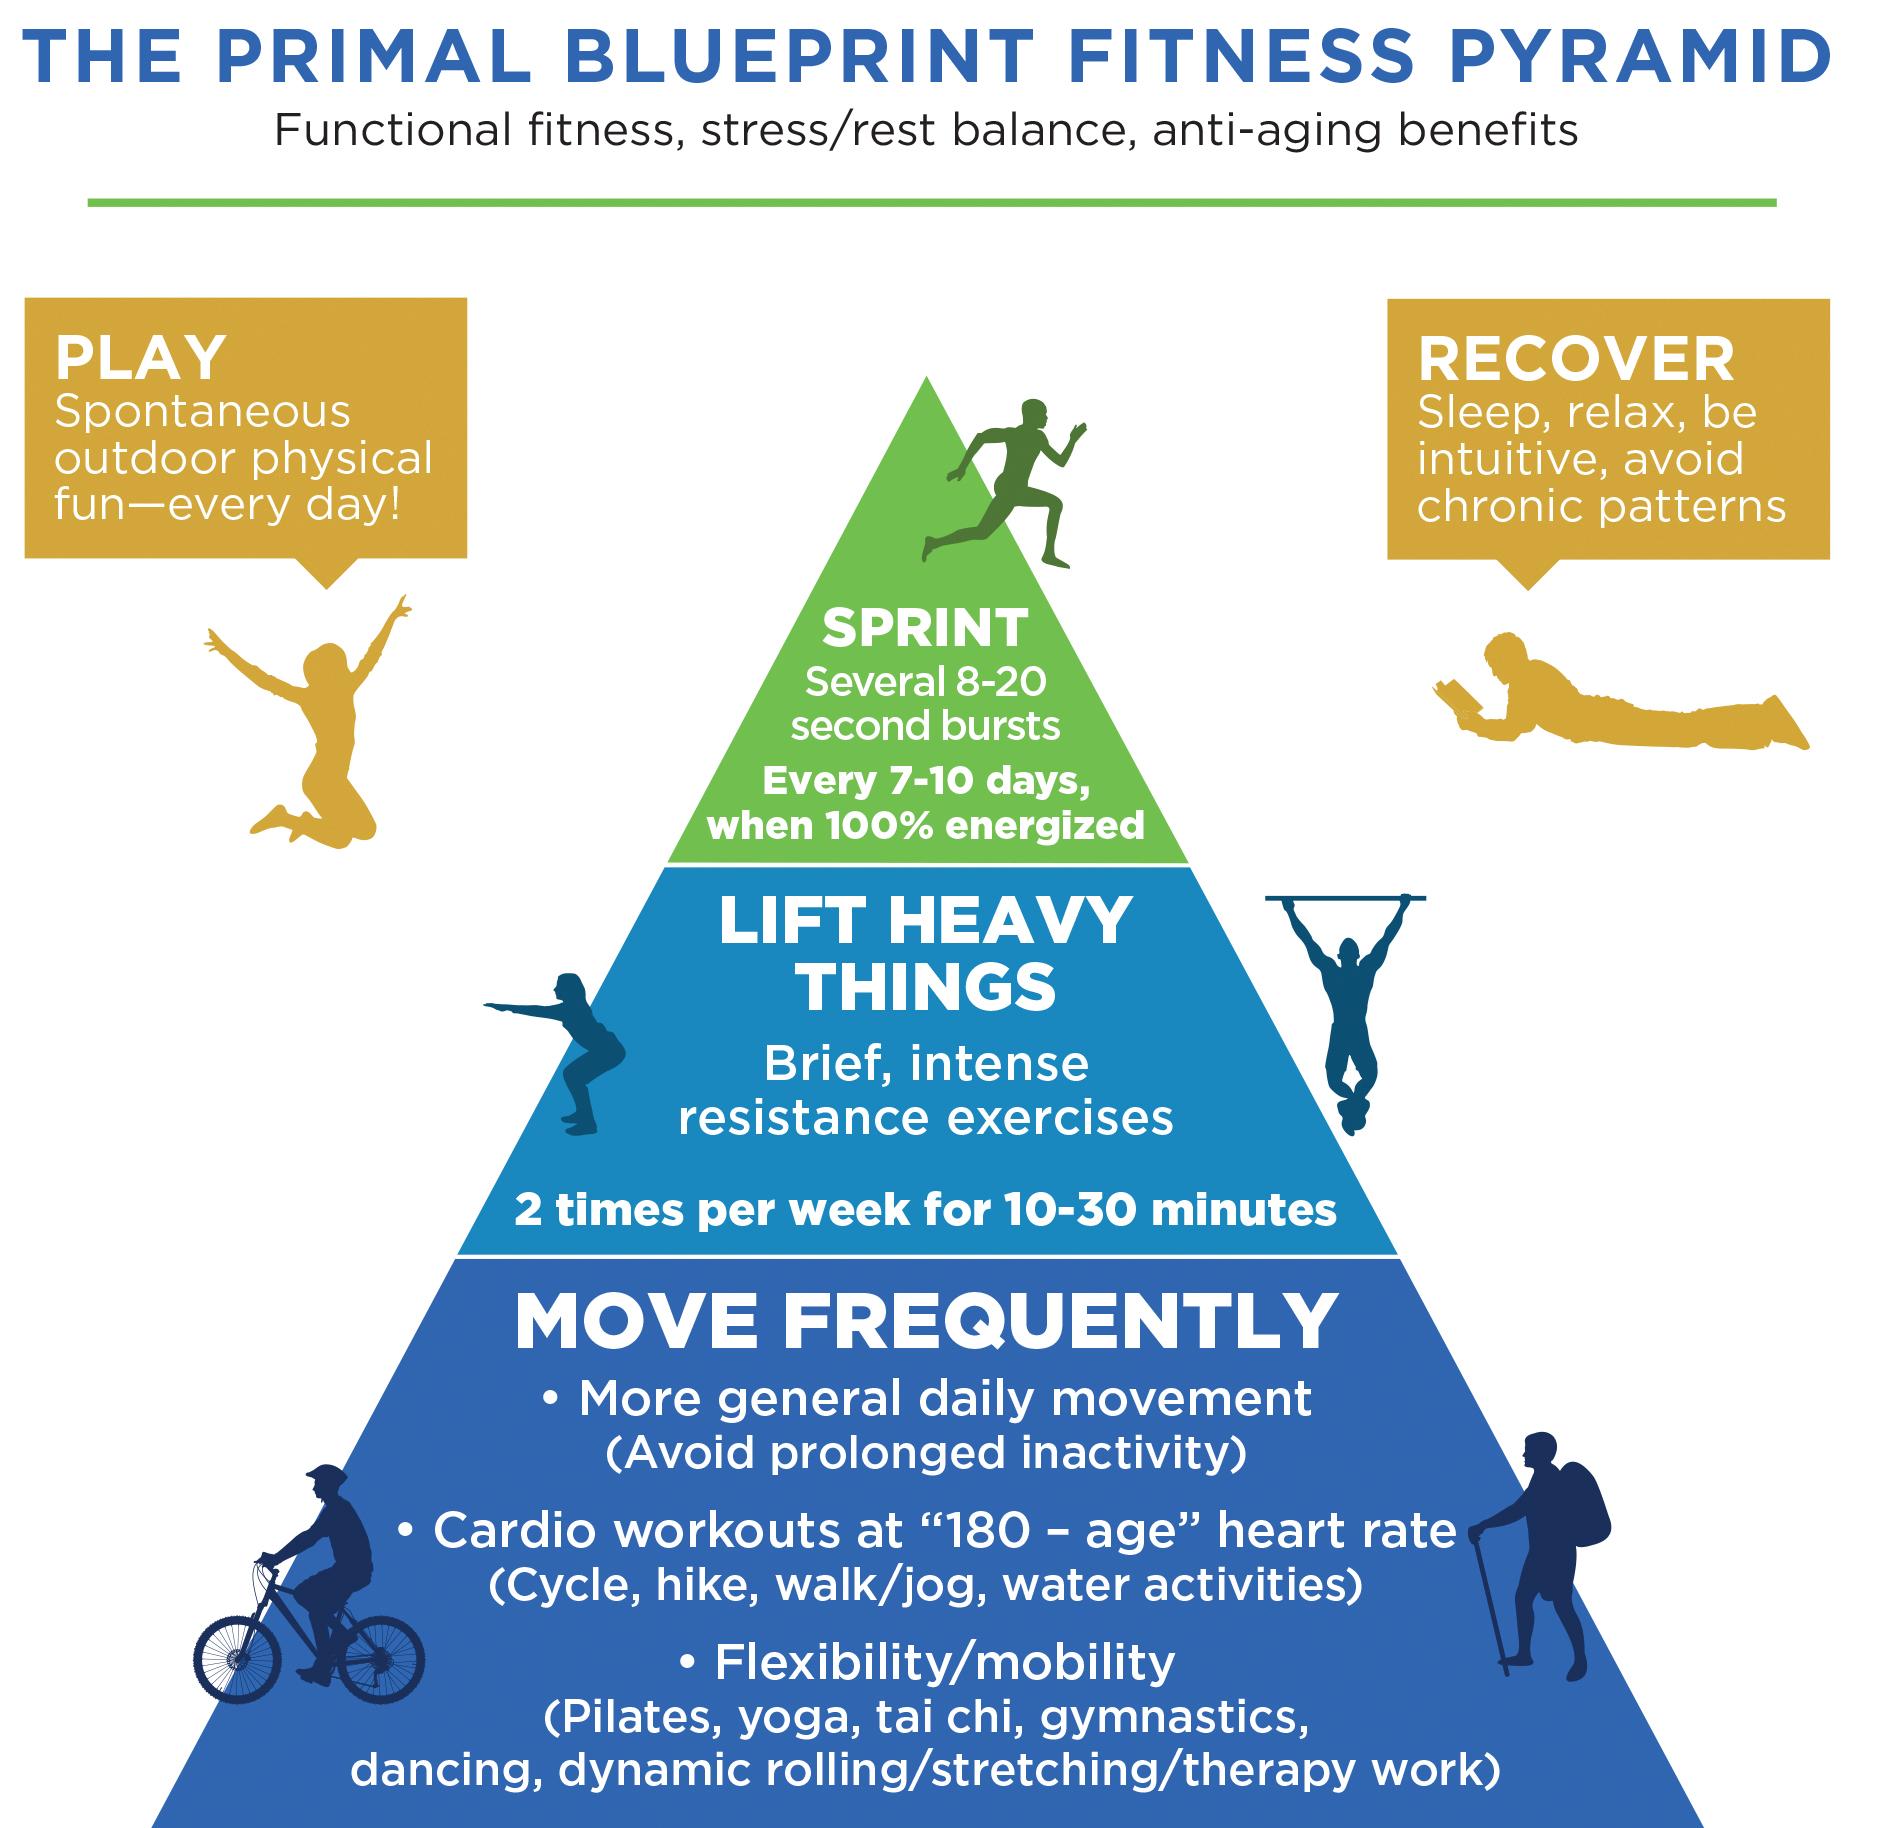 PB-Fitness-Pyramid-2016.jpg